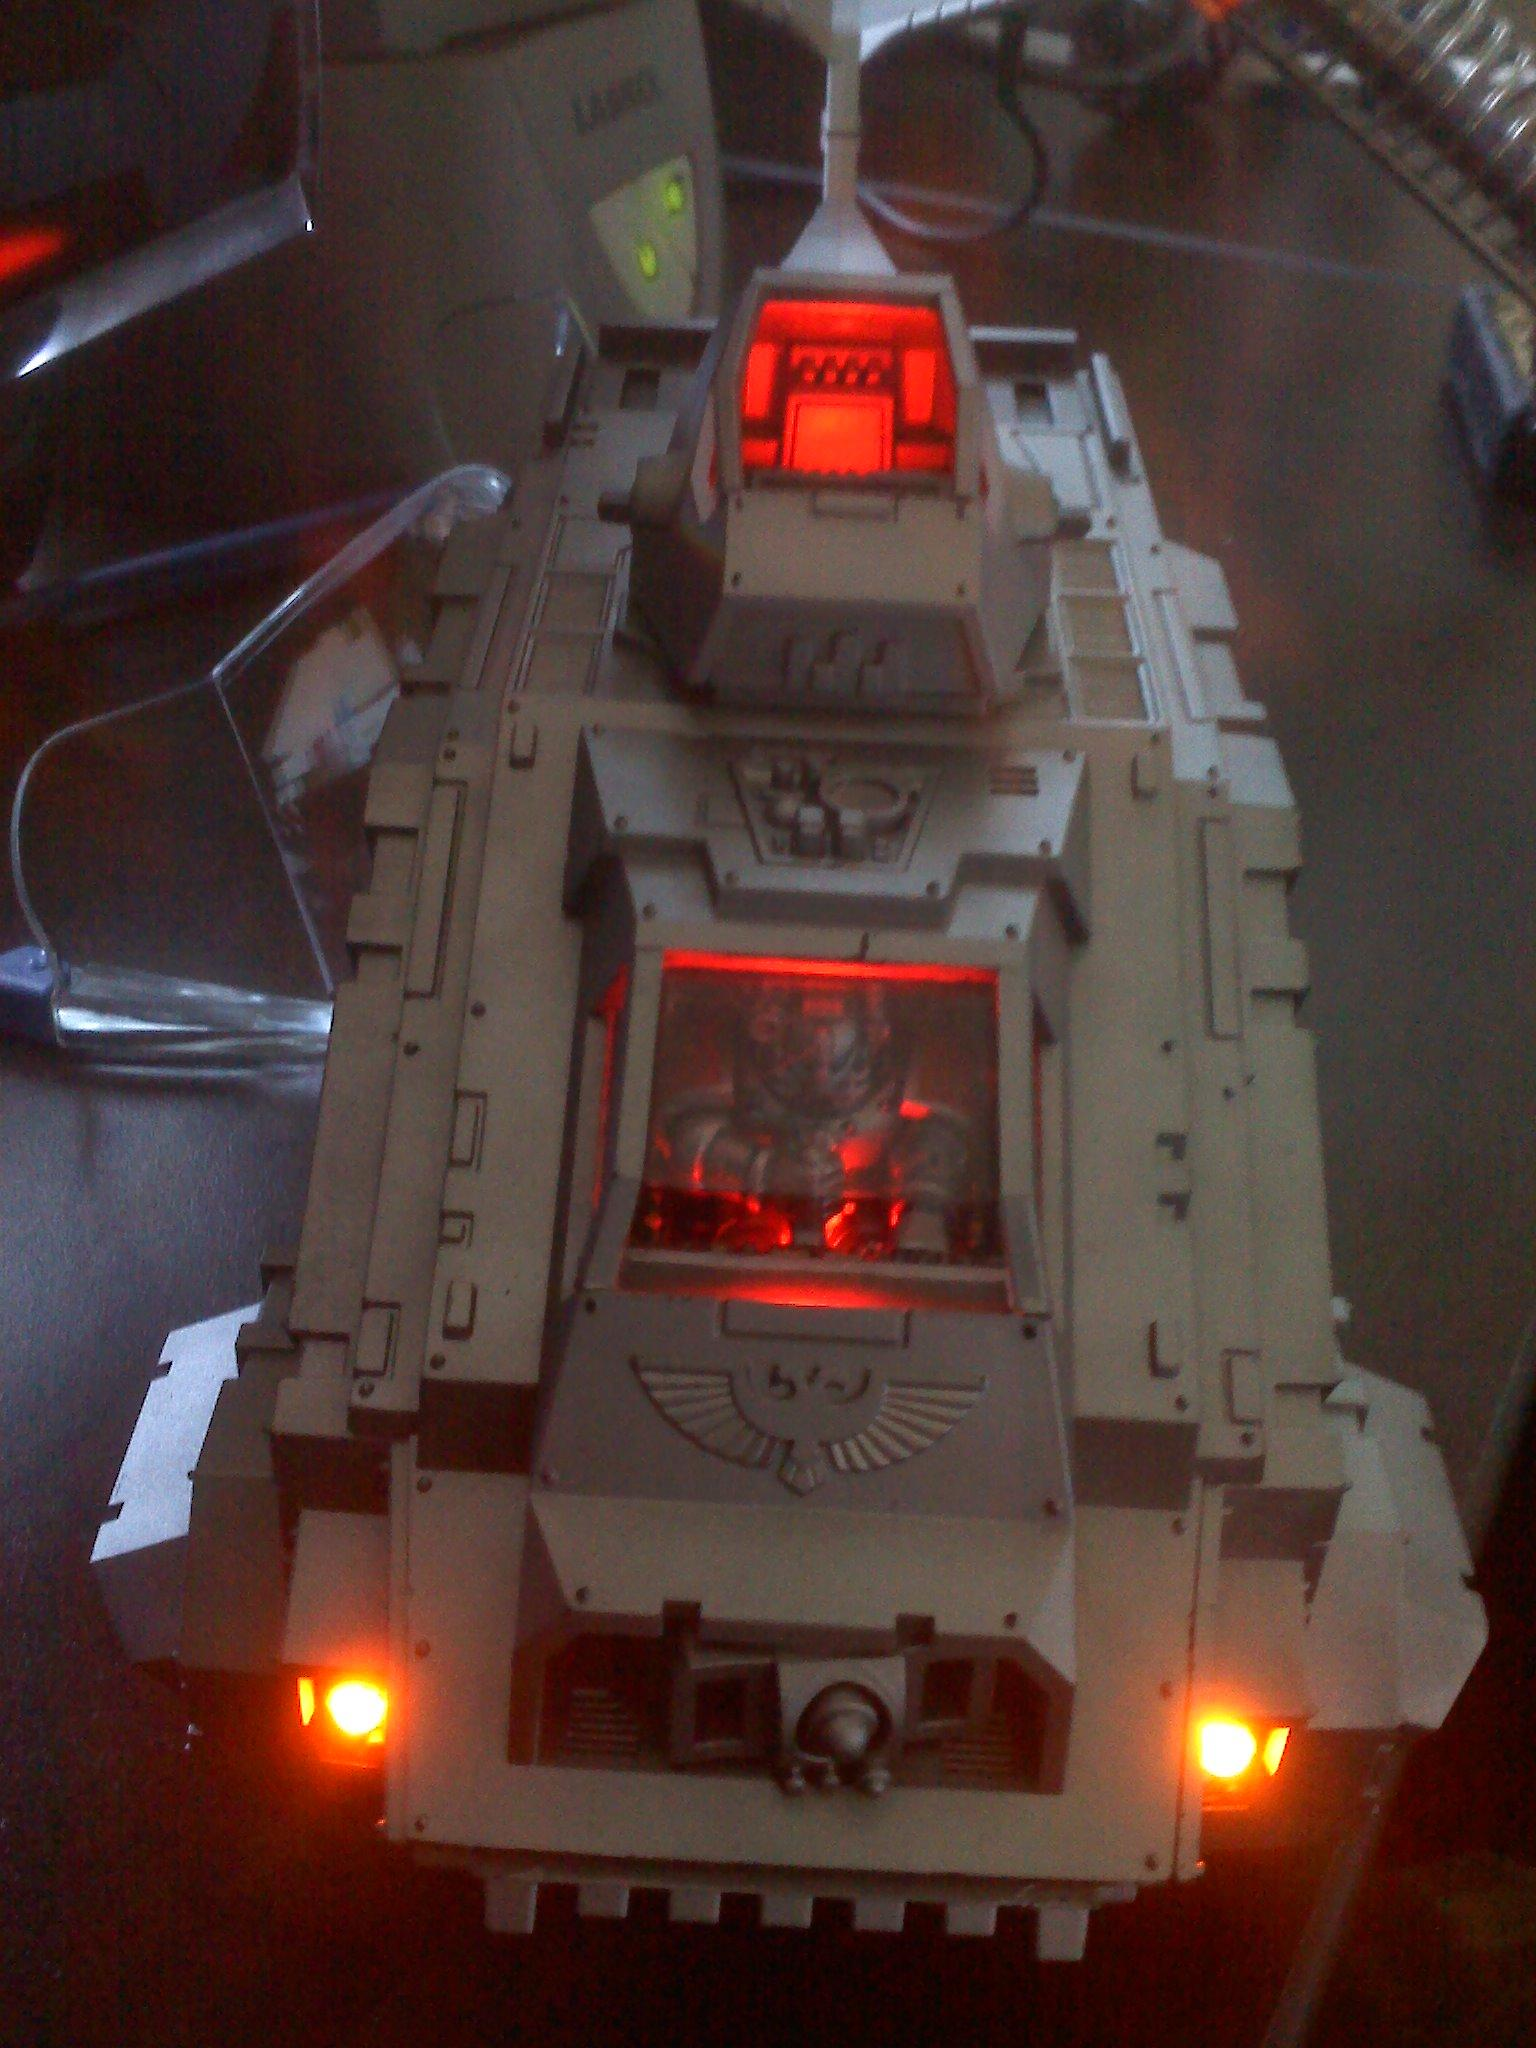 Conversion, LED, Space Marines., Warhammer 40,000, Work In Progress